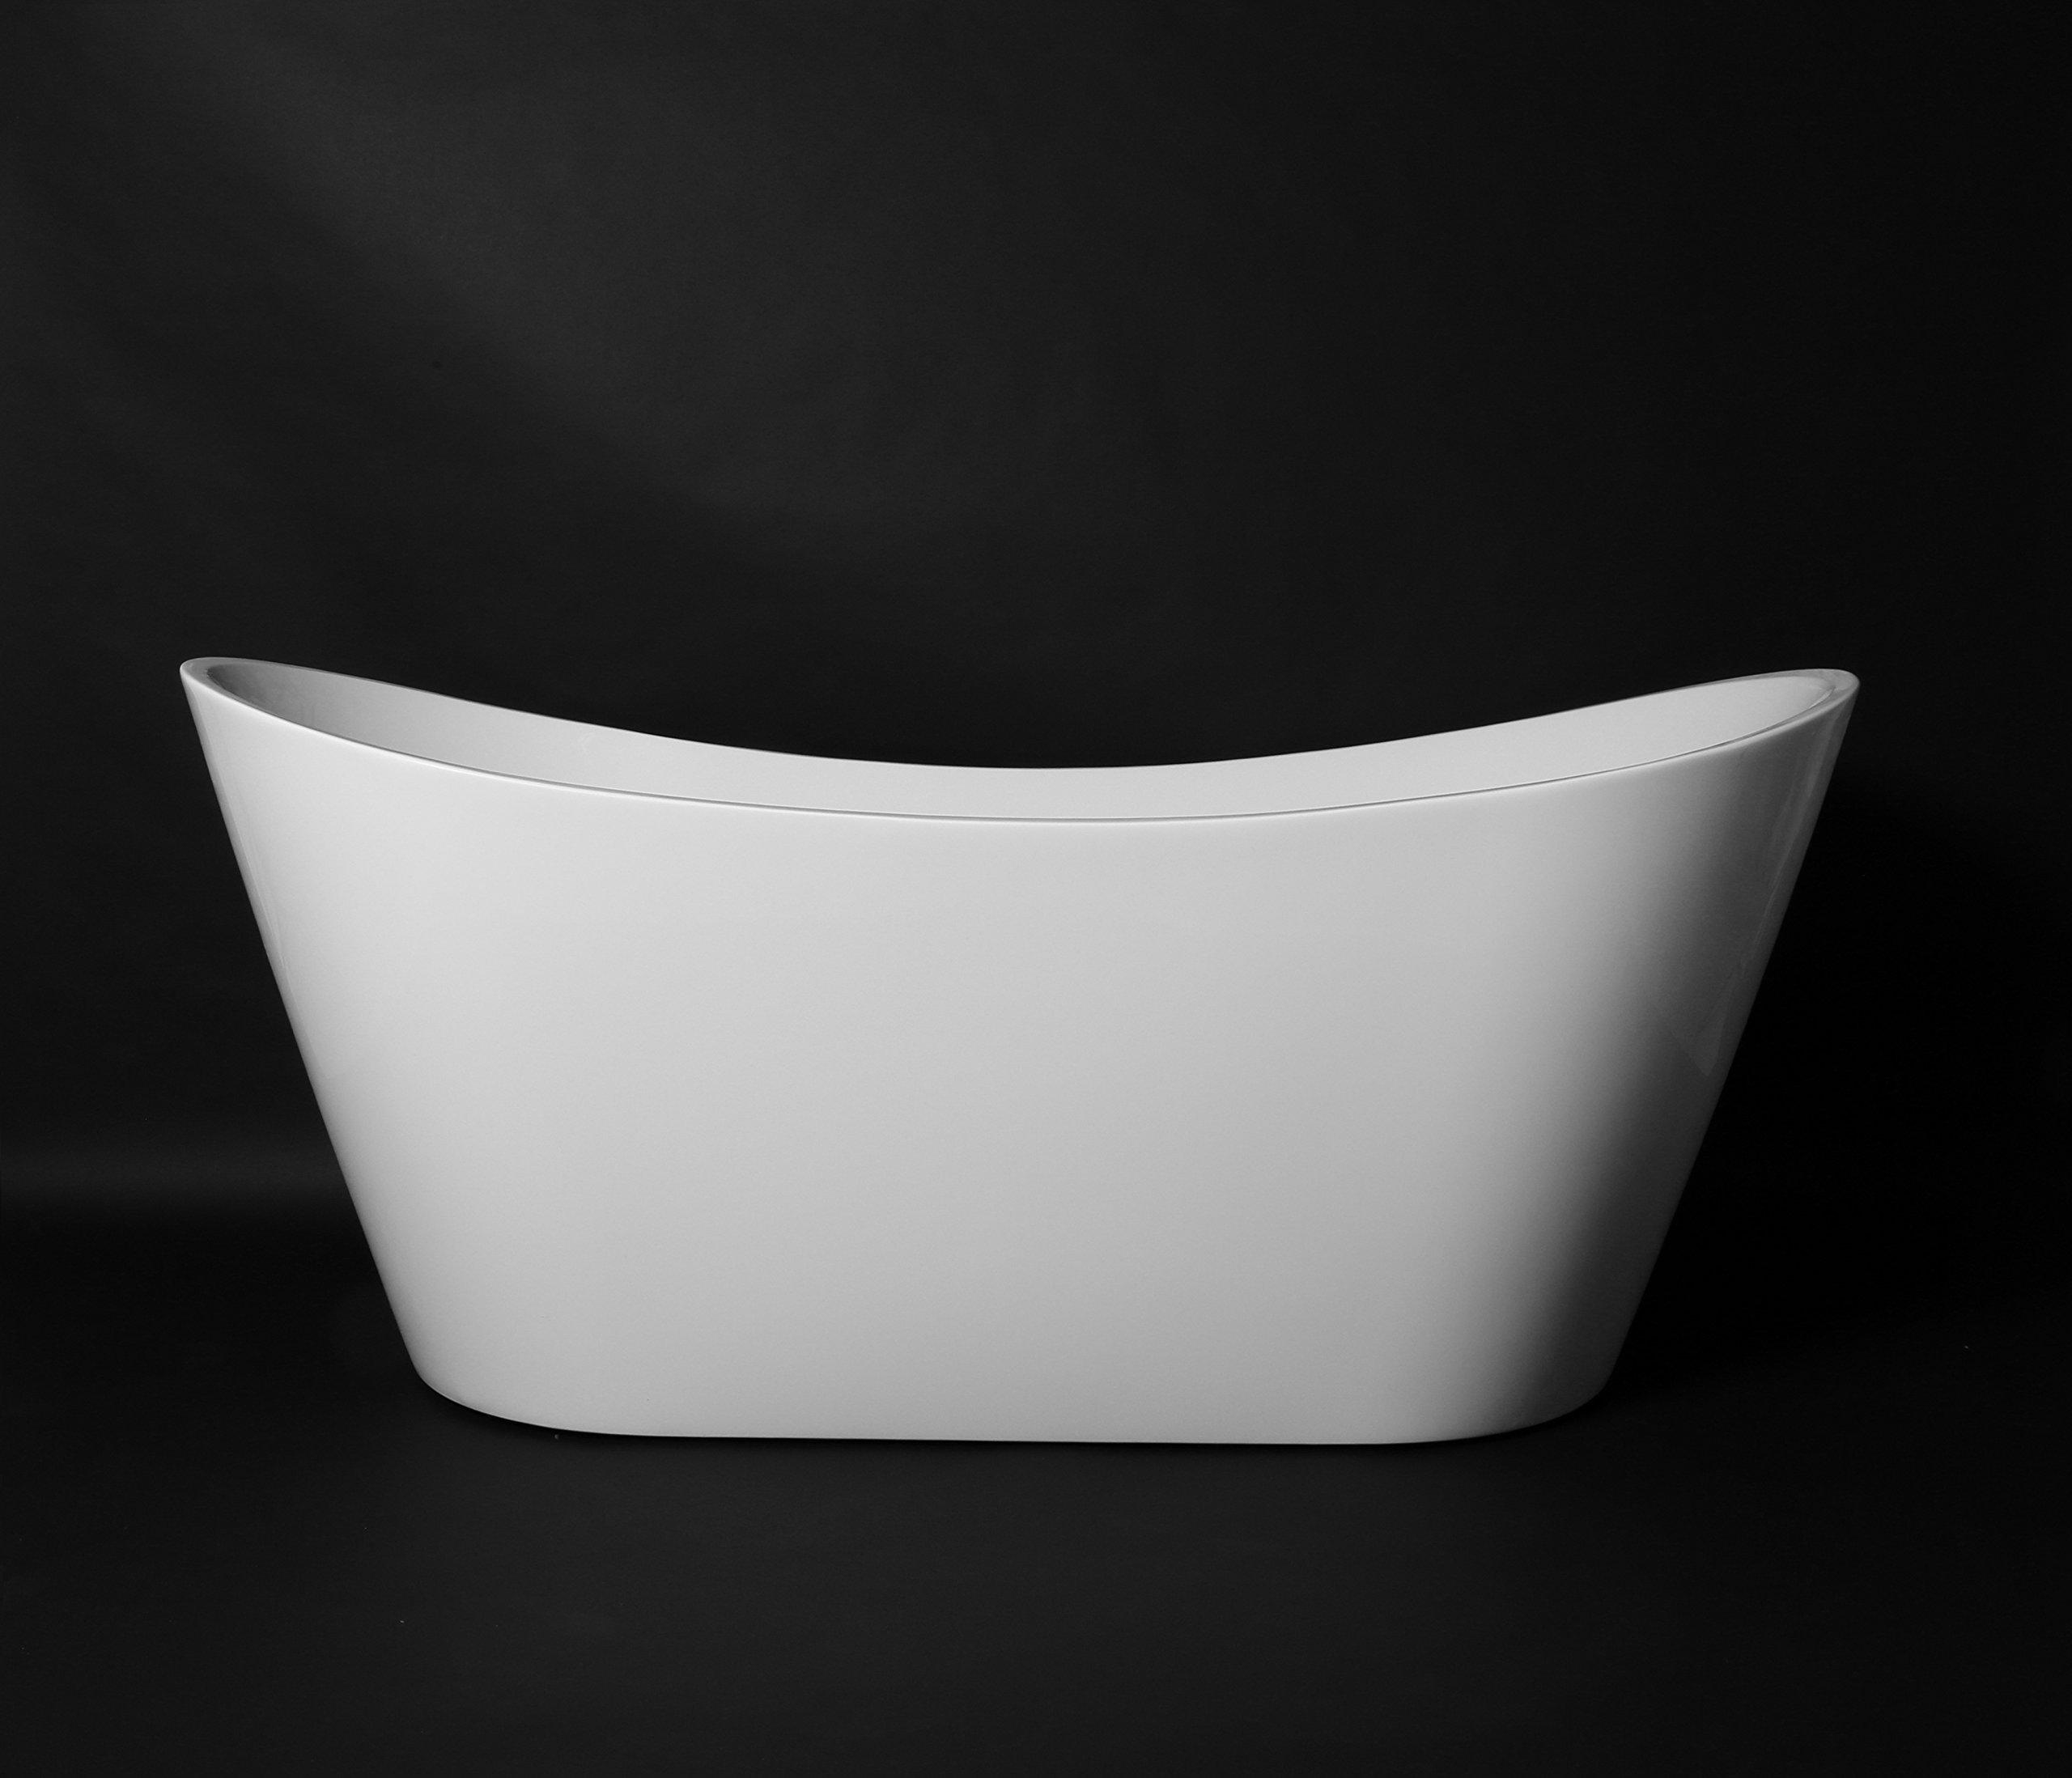 Kokss Bolsena Modern Acrylic Freestanding Soaking Bath Tub Spa 67'', White, Oval, Luxury hot tub spa